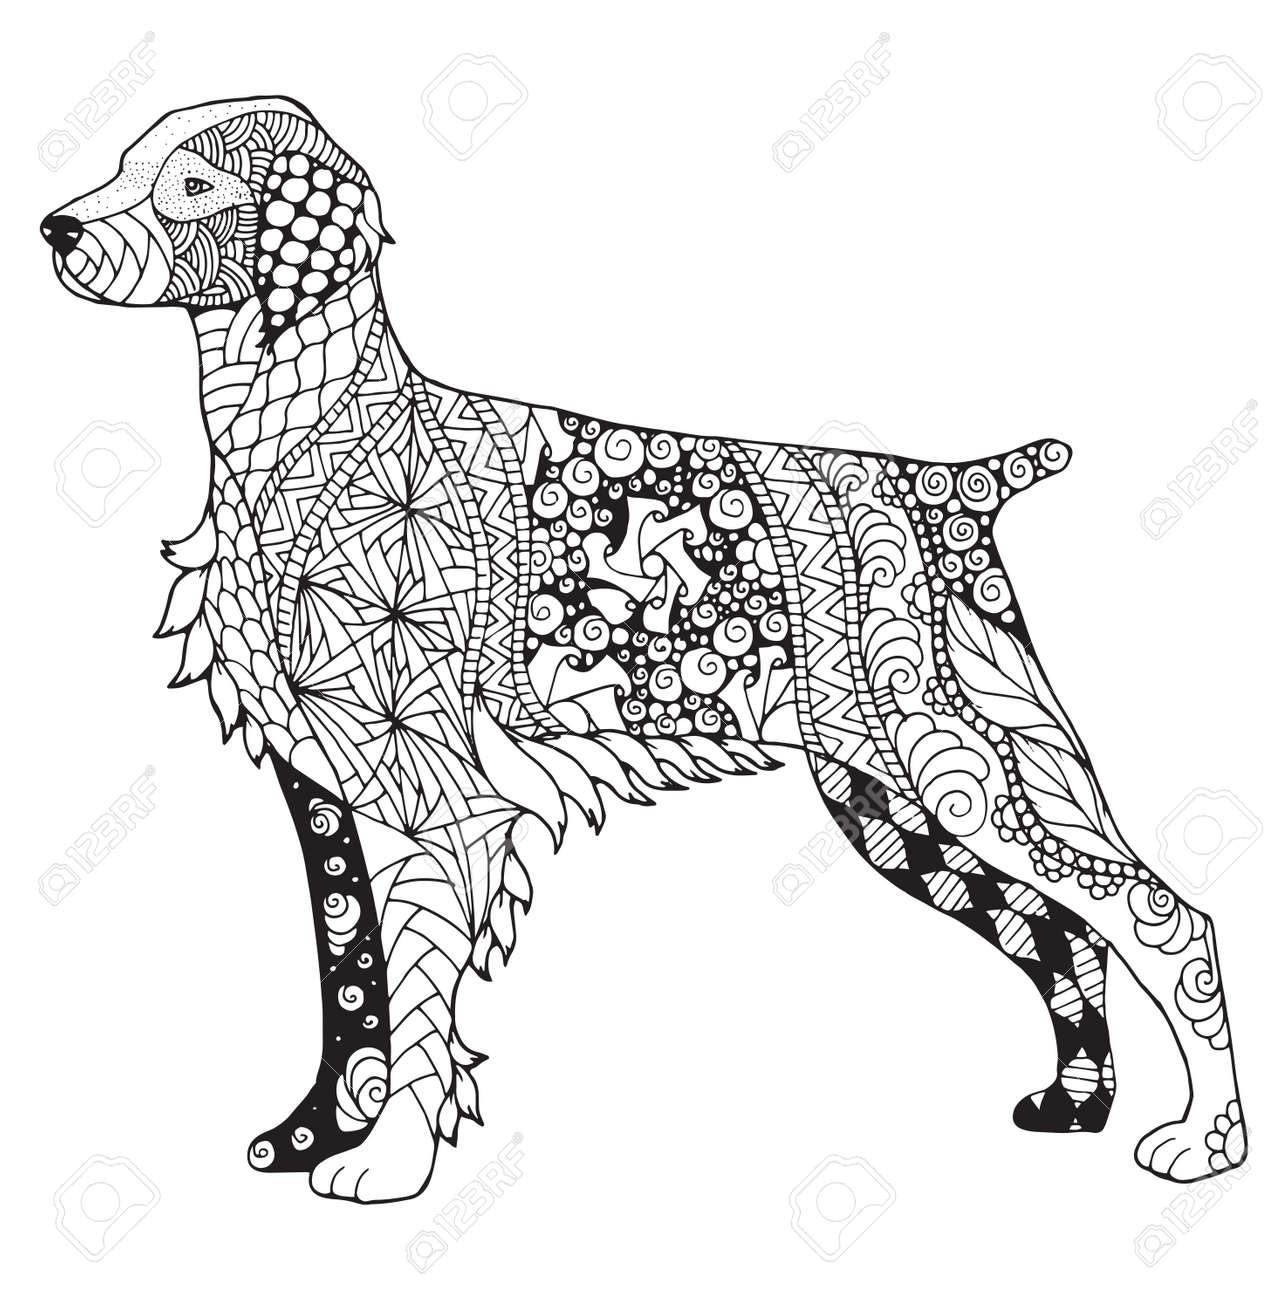 Brittany dog zentangle stylized, vector, illustration, freehand pencil, hand drawn, pattern. Zen art. - 80629076